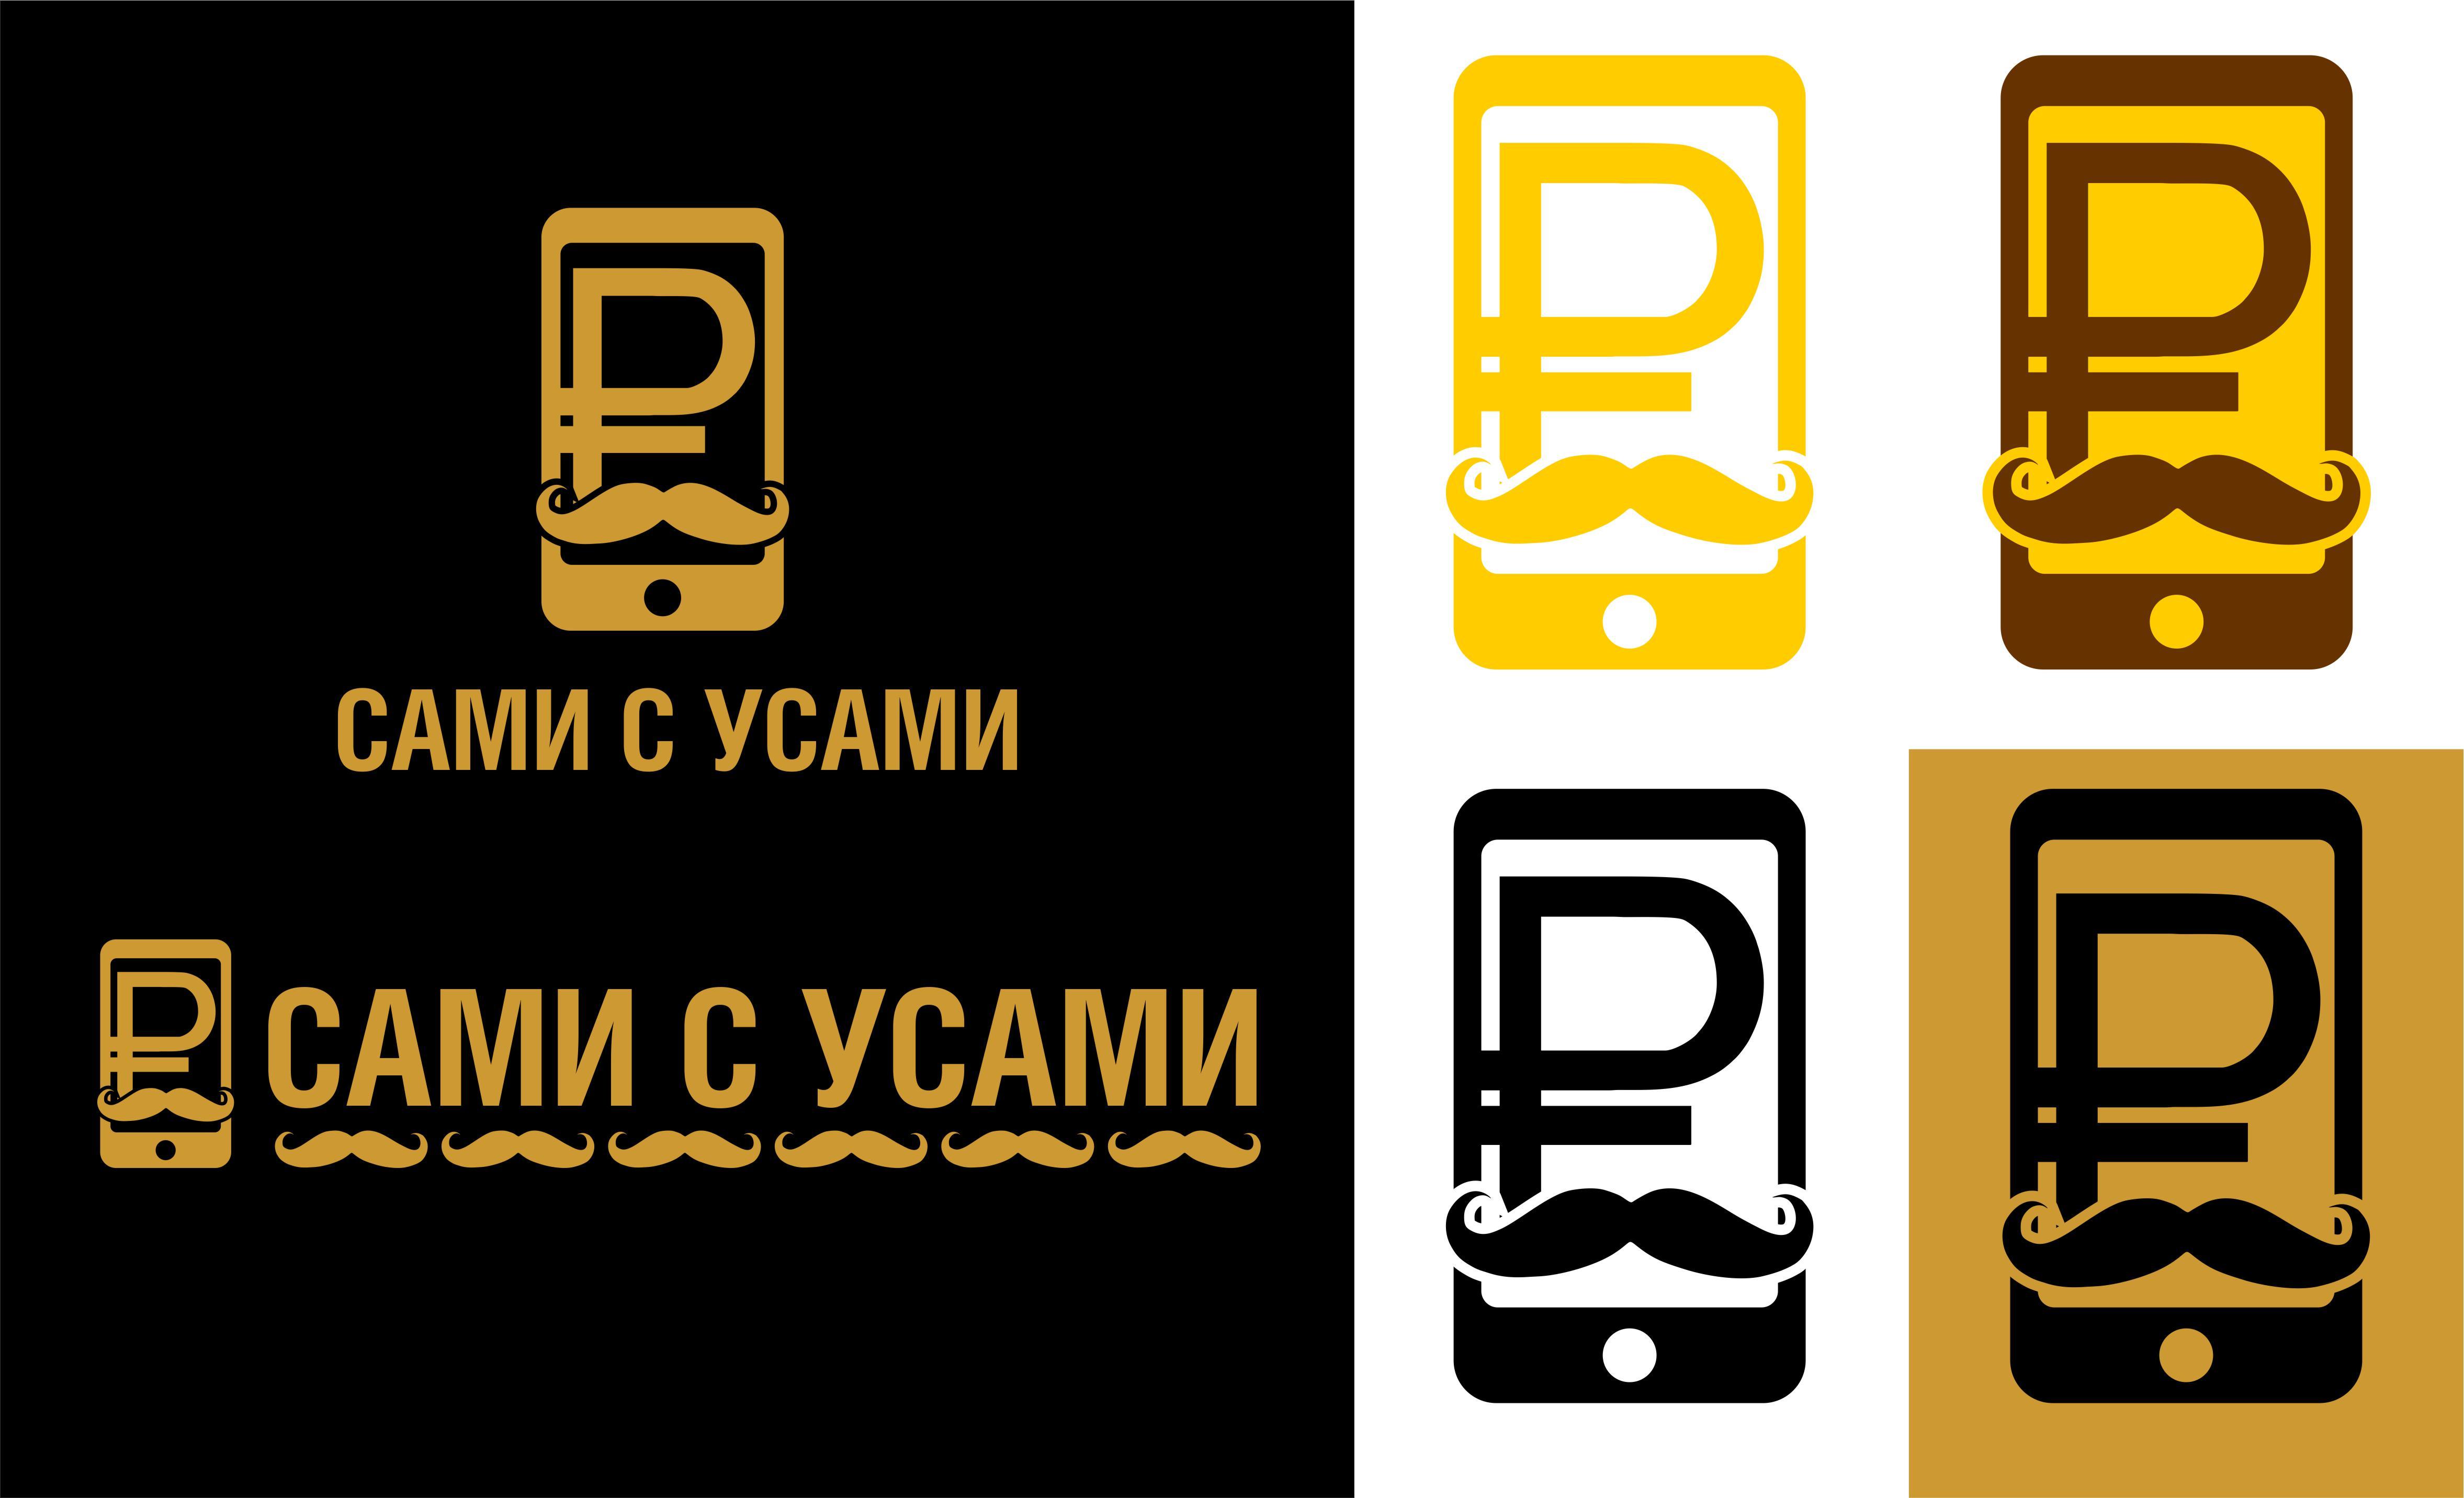 Разработка Логотипа 6 000 руб. фото f_24858f7752bbc510.jpg